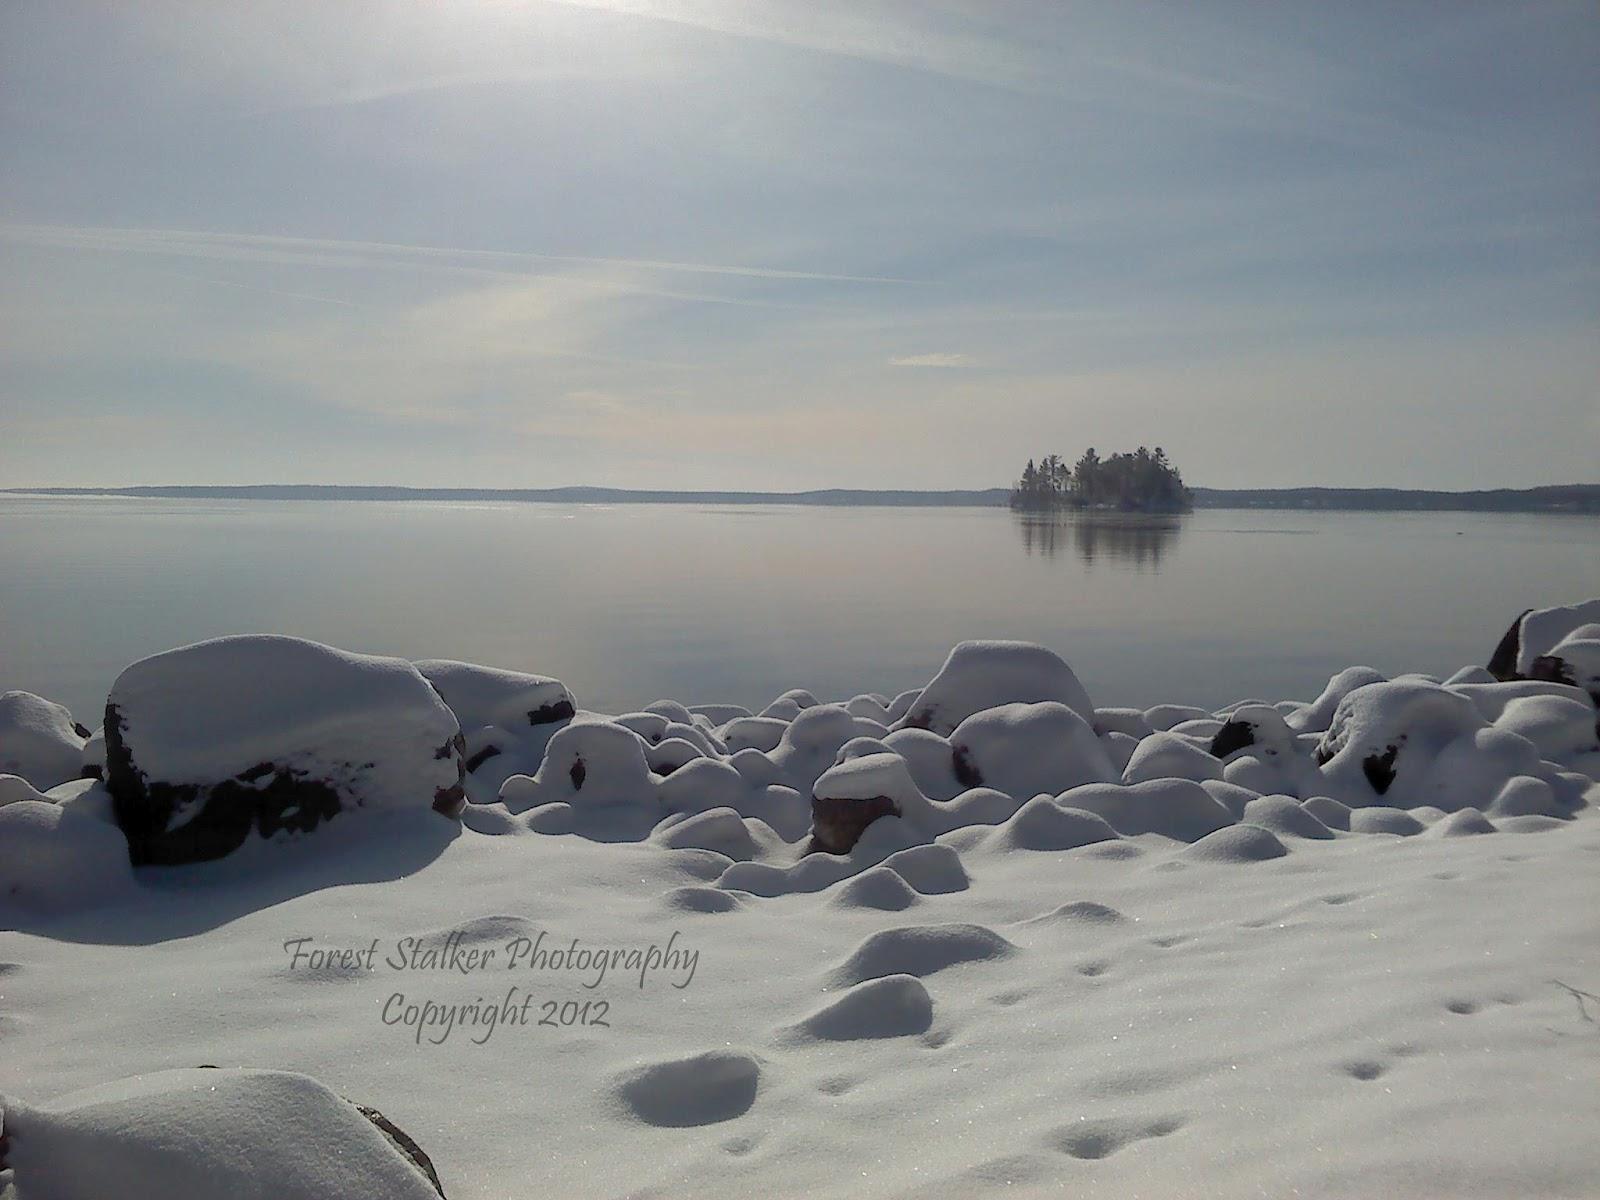 http://3.bp.blogspot.com/-FPay2JxG3yI/UCV9iPuluTI/AAAAAAAAAX4/pSgKAEhg5cc/s1600/snow+rocks+wallpaper.jpg